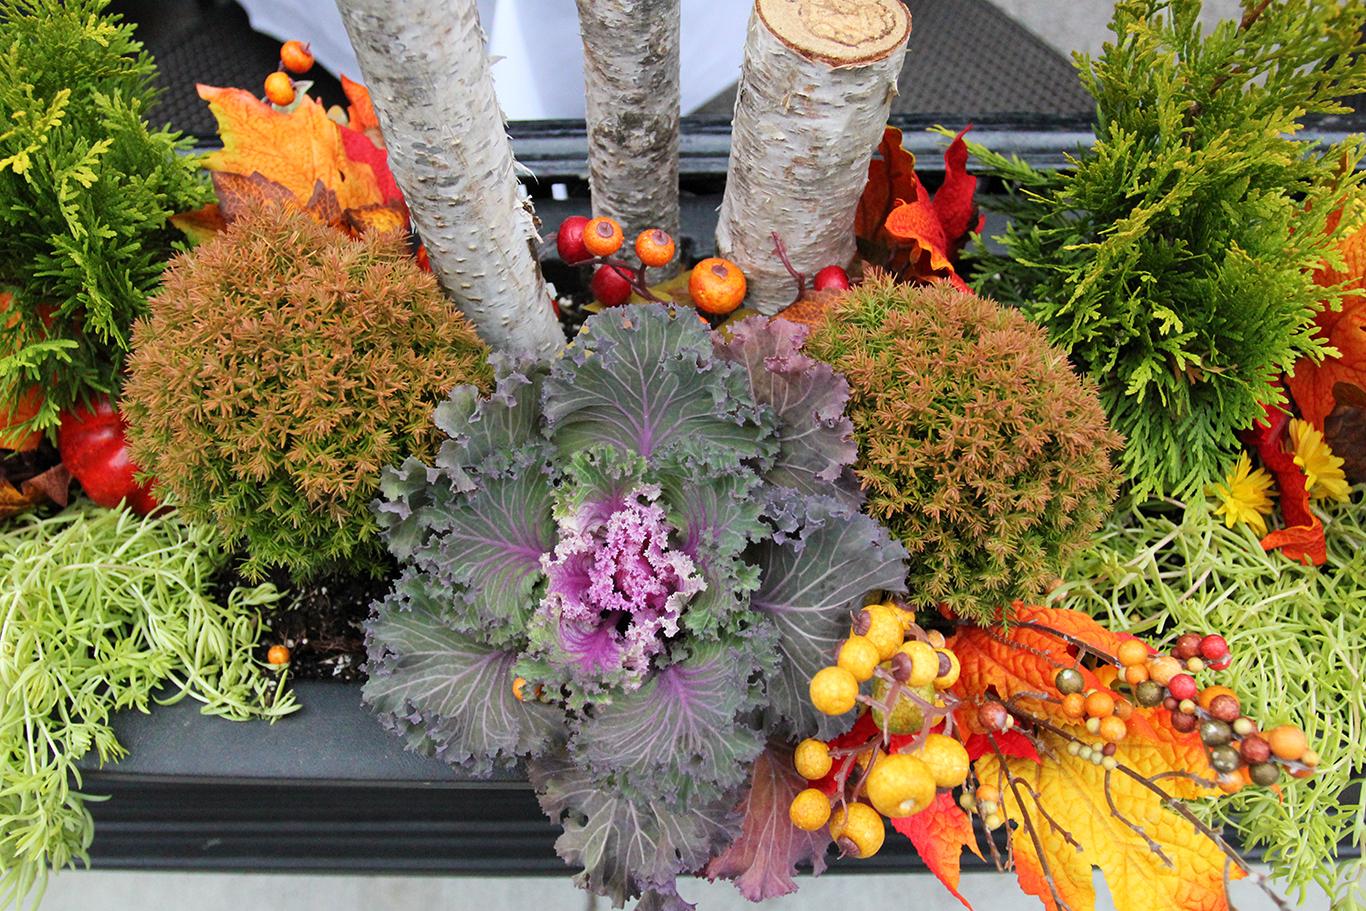 Decorative Fall Planter in Front of Atlantic Fish in Boston